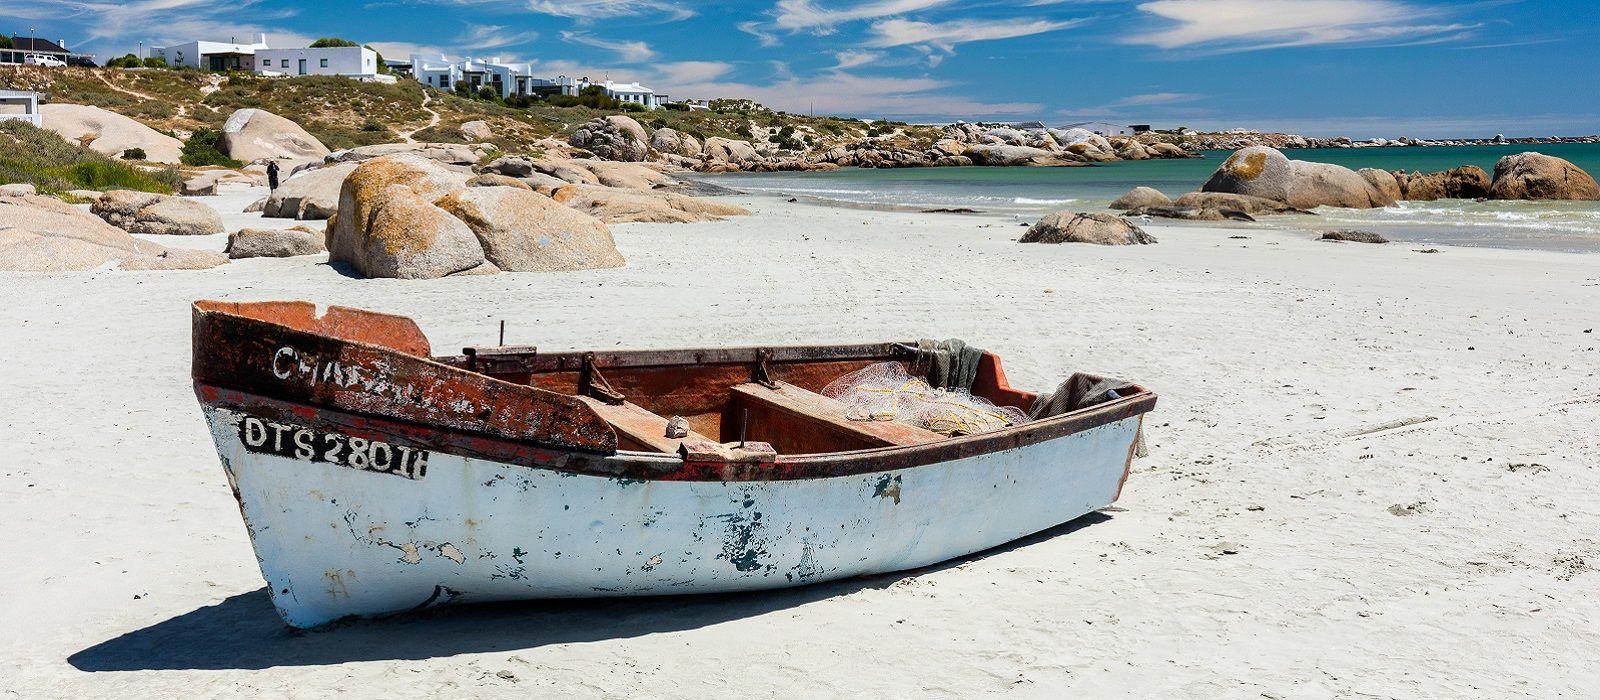 Destination Paternoster South Africa